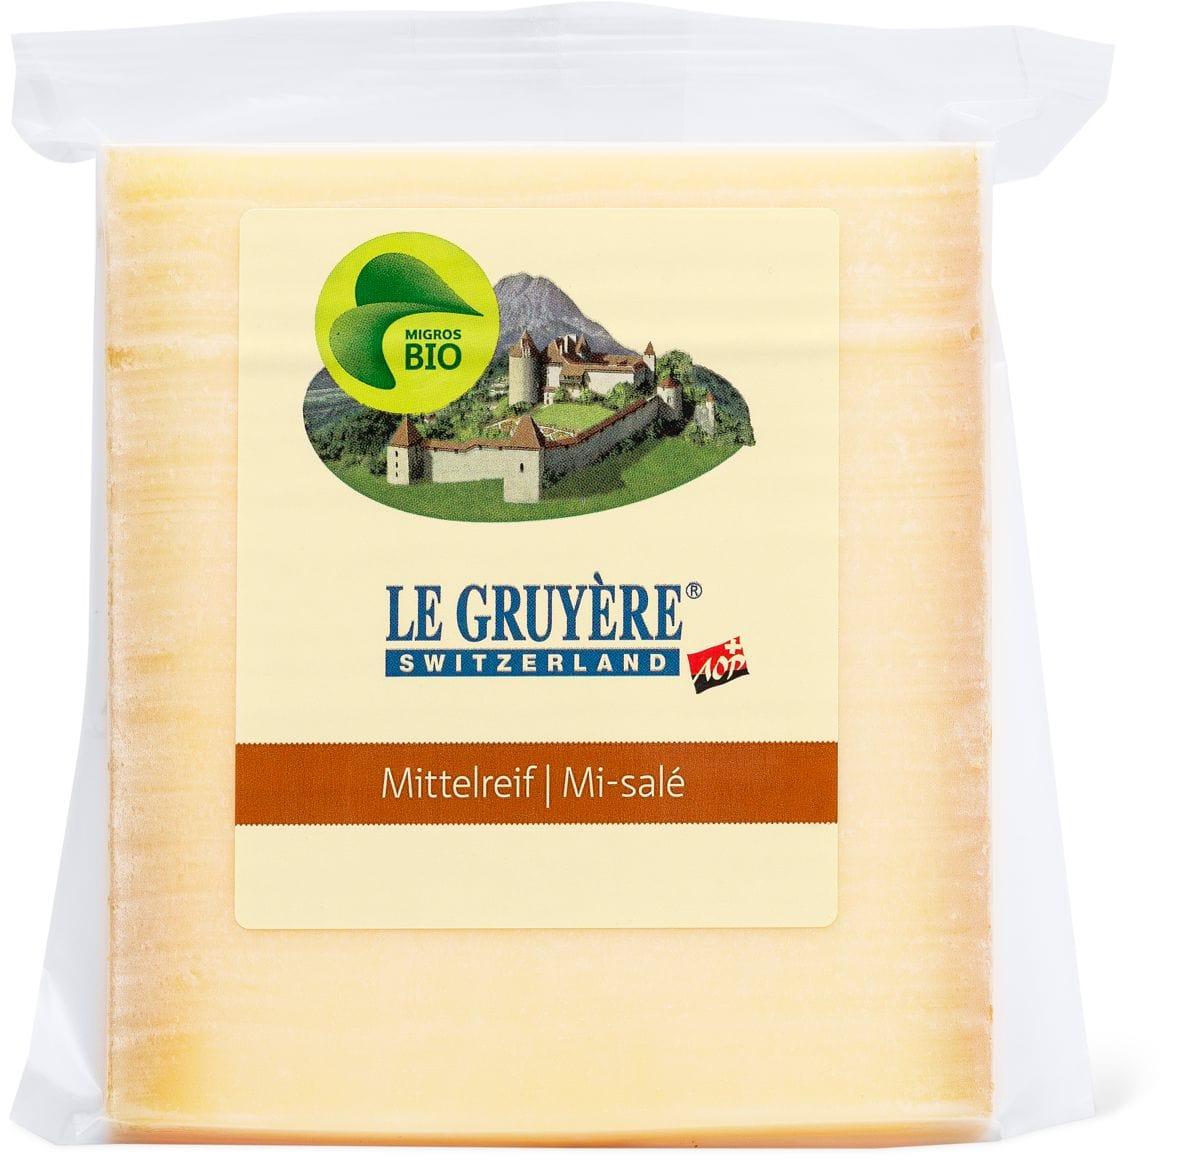 Bio-Le Gruyère mittelreif